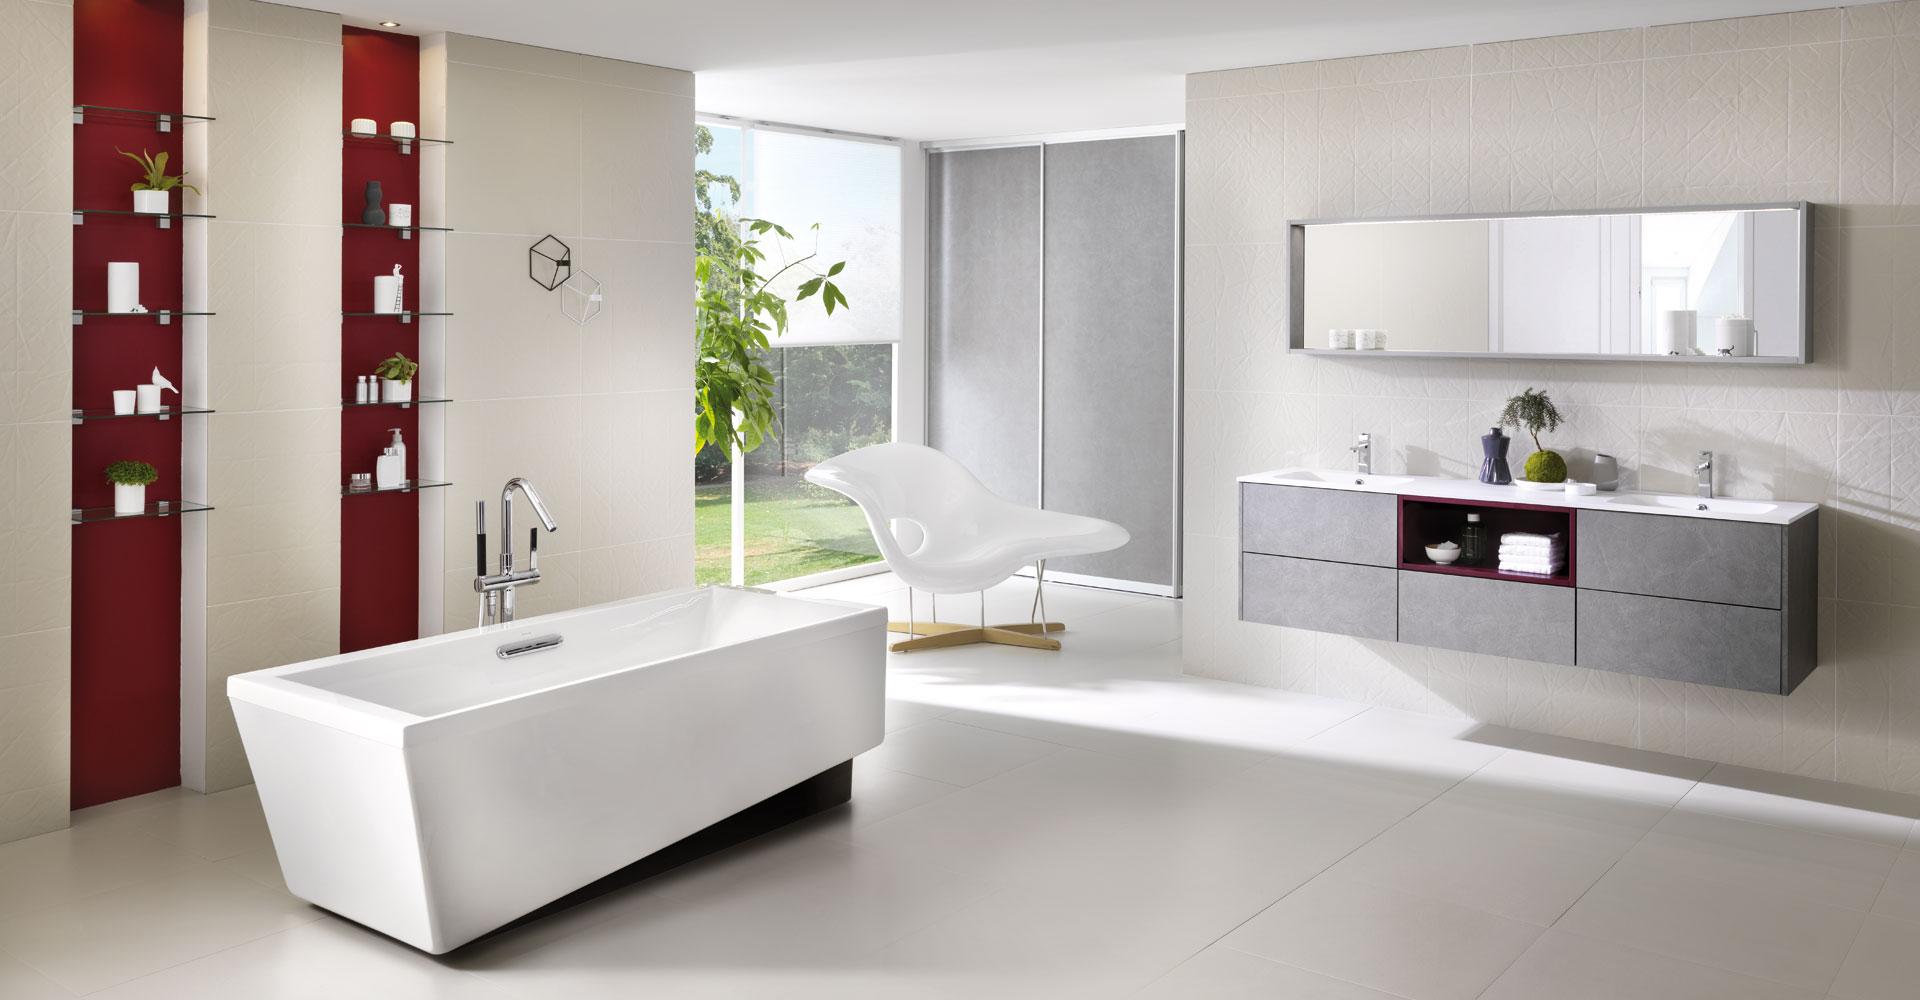 Salle de bains avec douche ou baignoire ? - Blog Schmidt